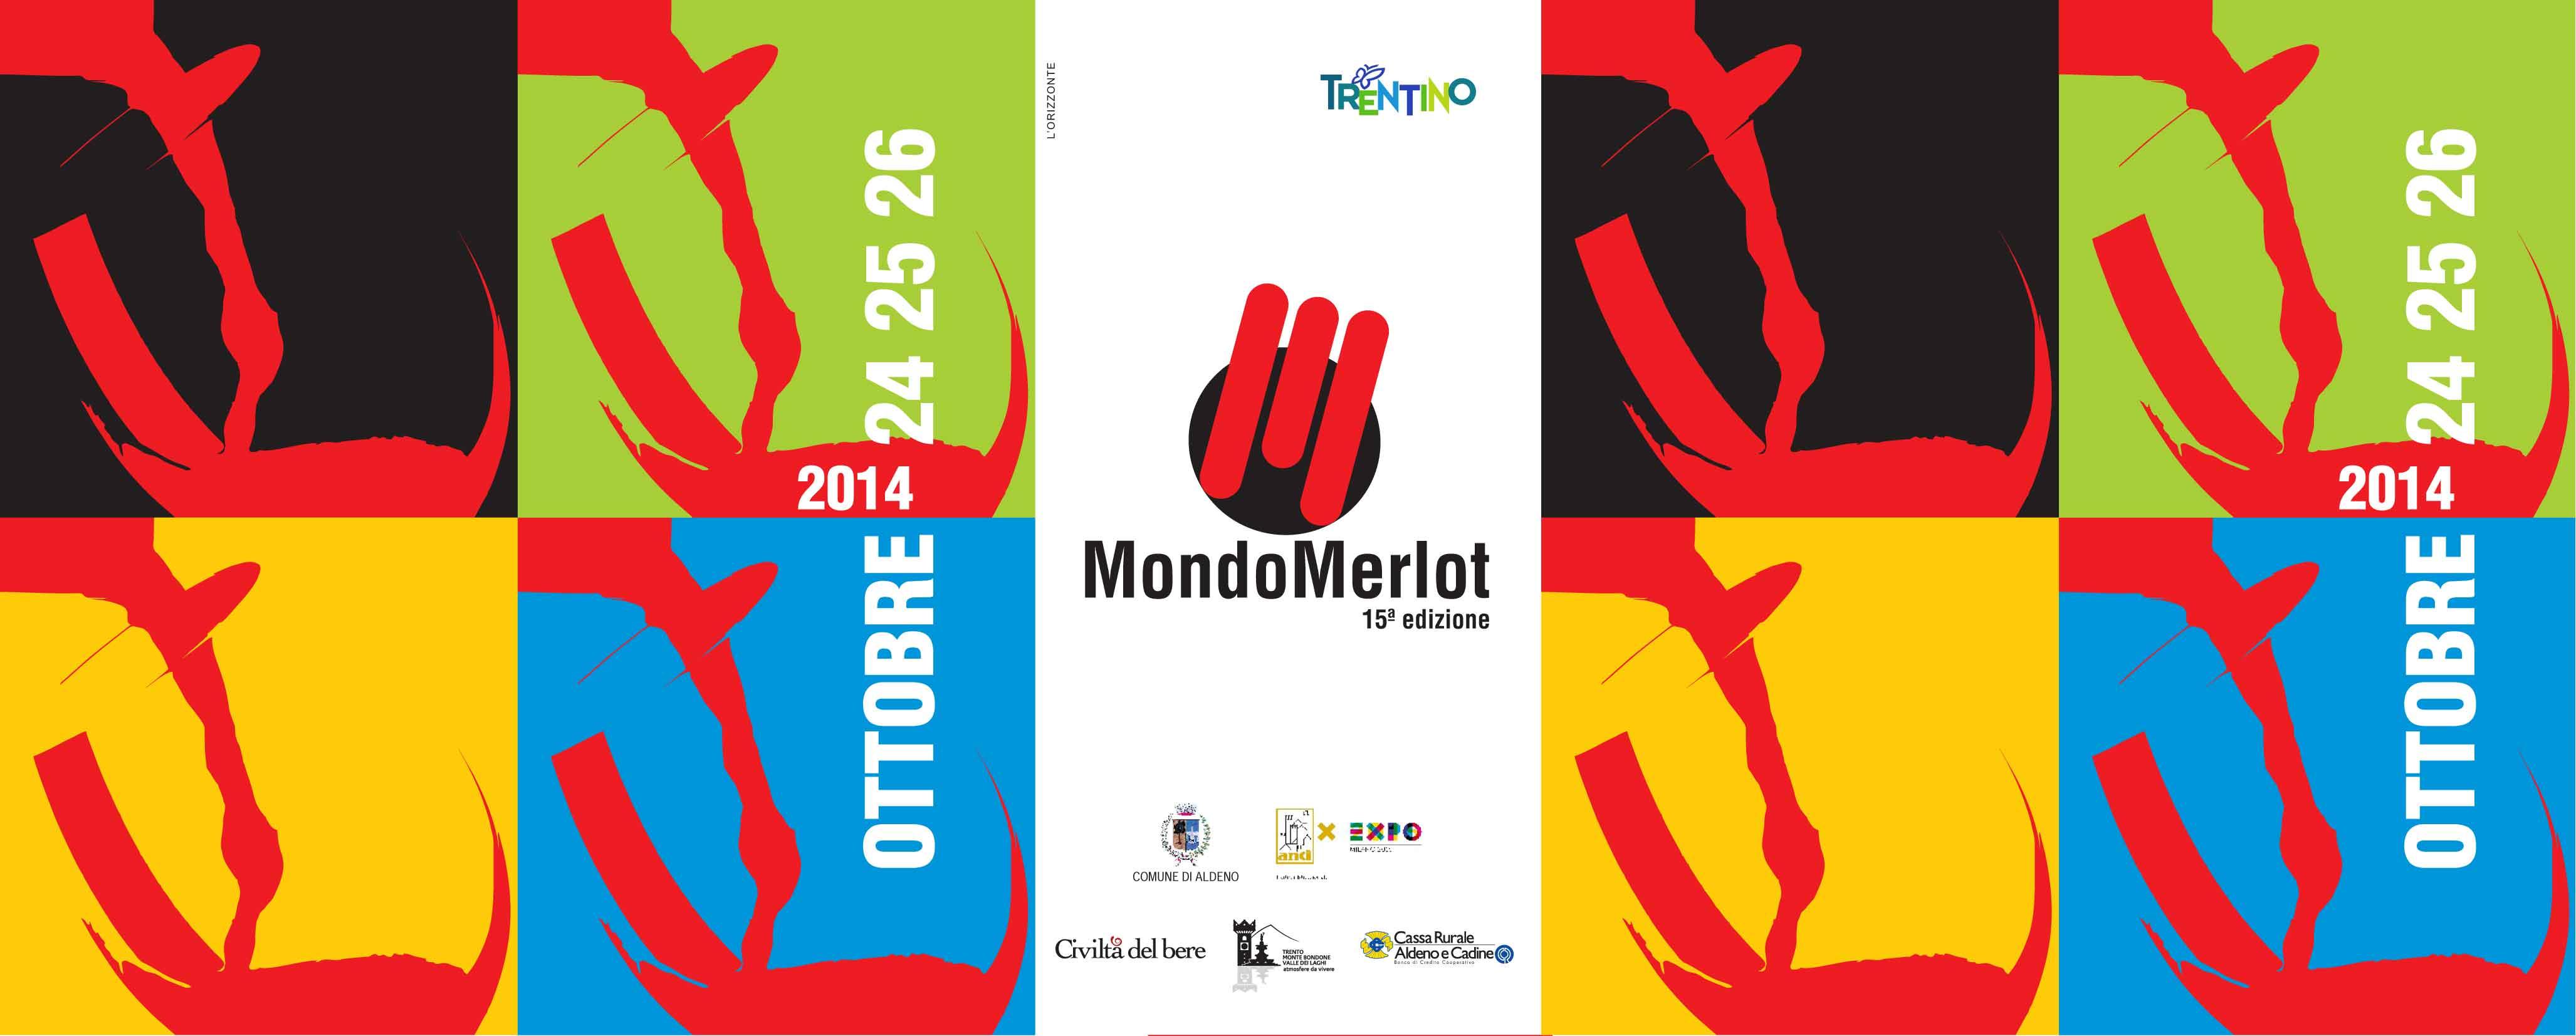 Aldeno, ecco MondoMerlot 2014